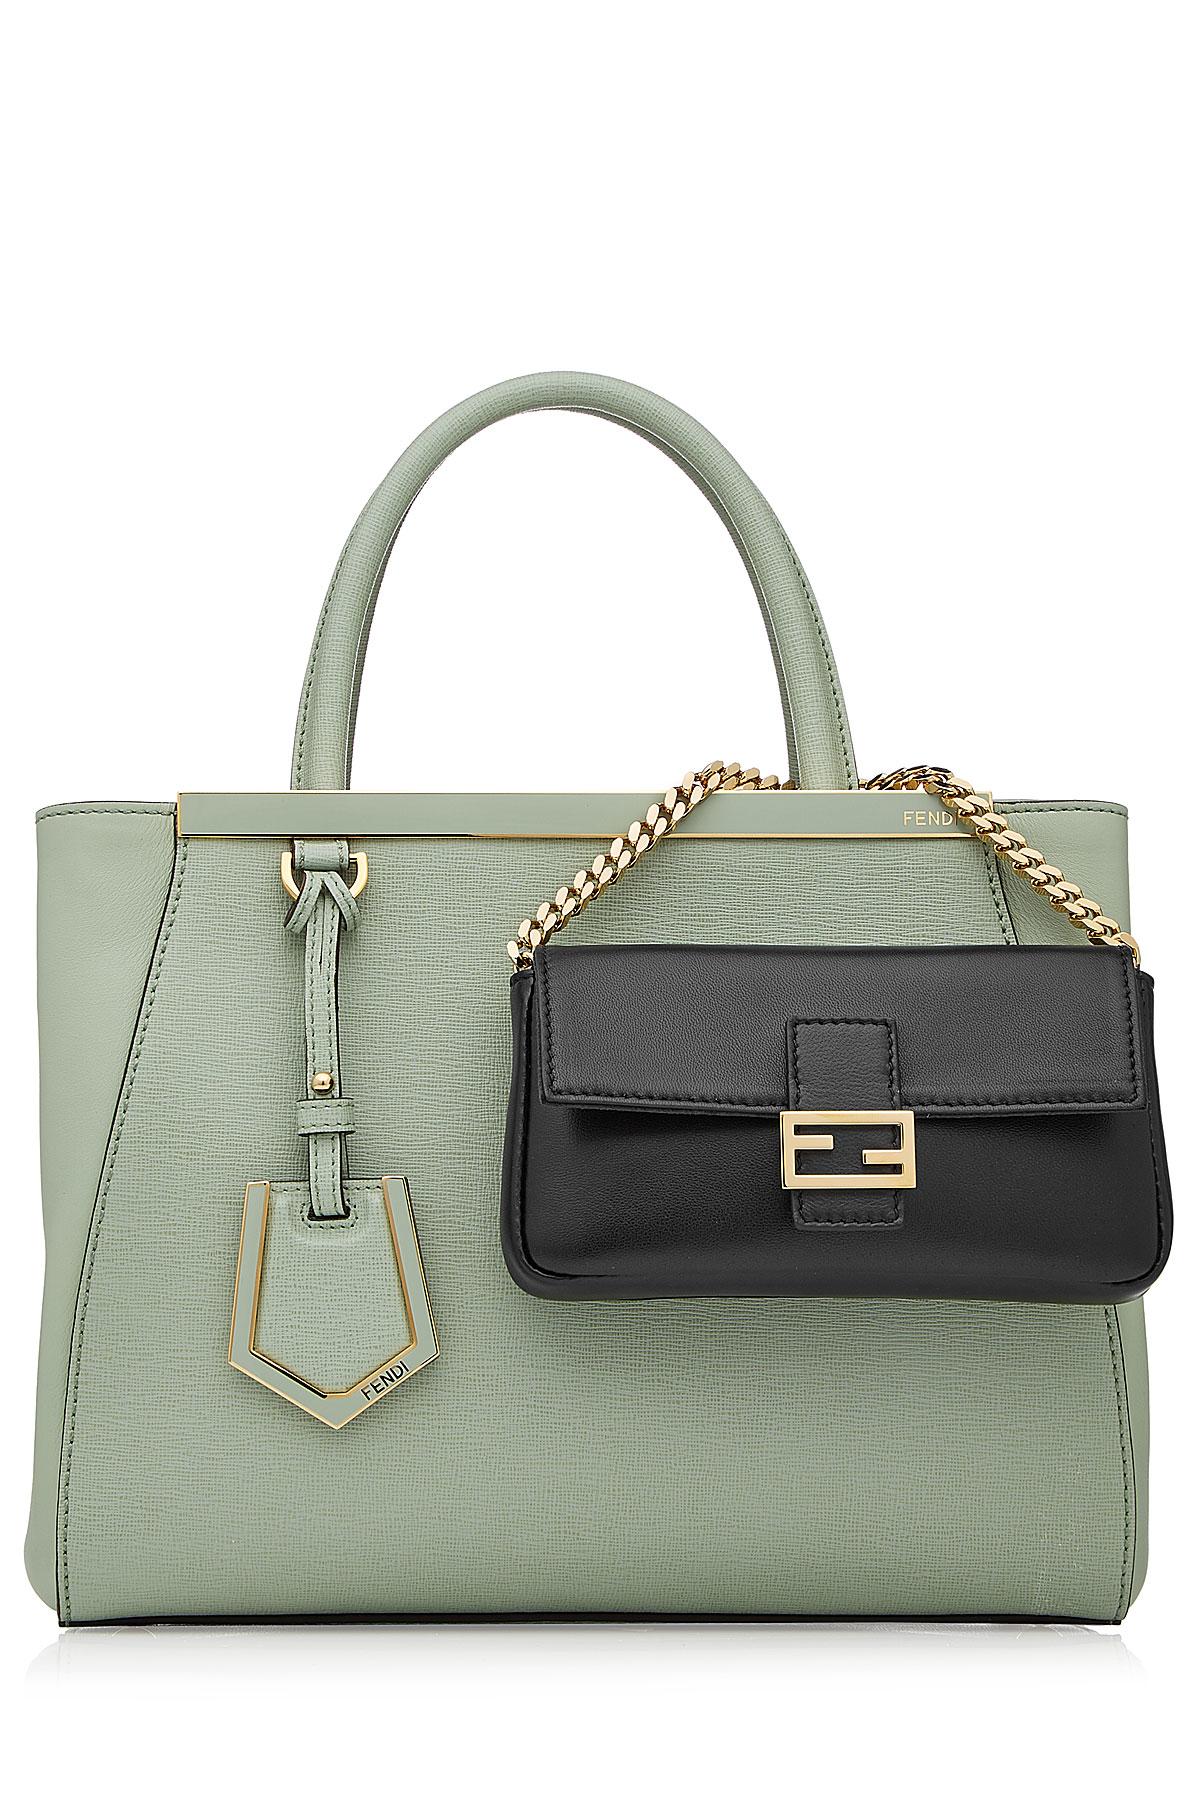 defe5f27b4cc Lyst - Fendi Micro Baguette Leather Shoulder Bag - Black in Black